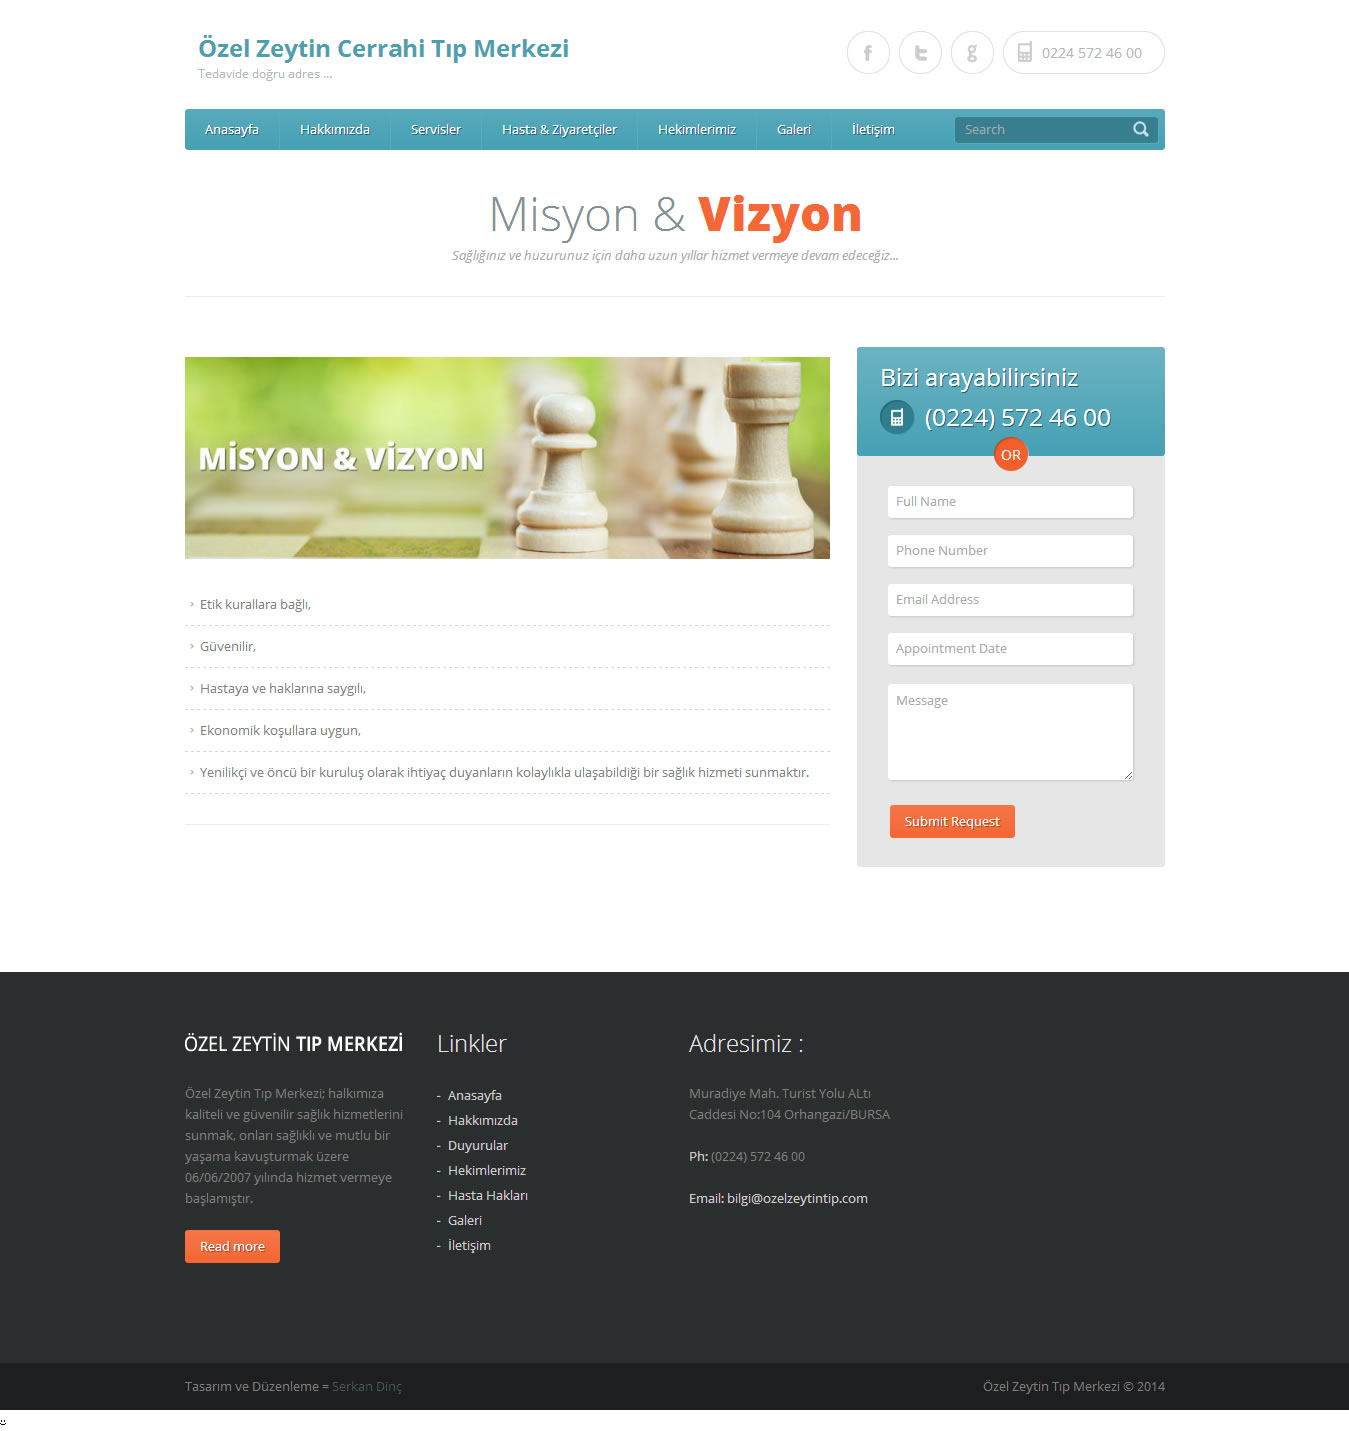 Özel Zeytin Tıp Merkezi Web Sitesi